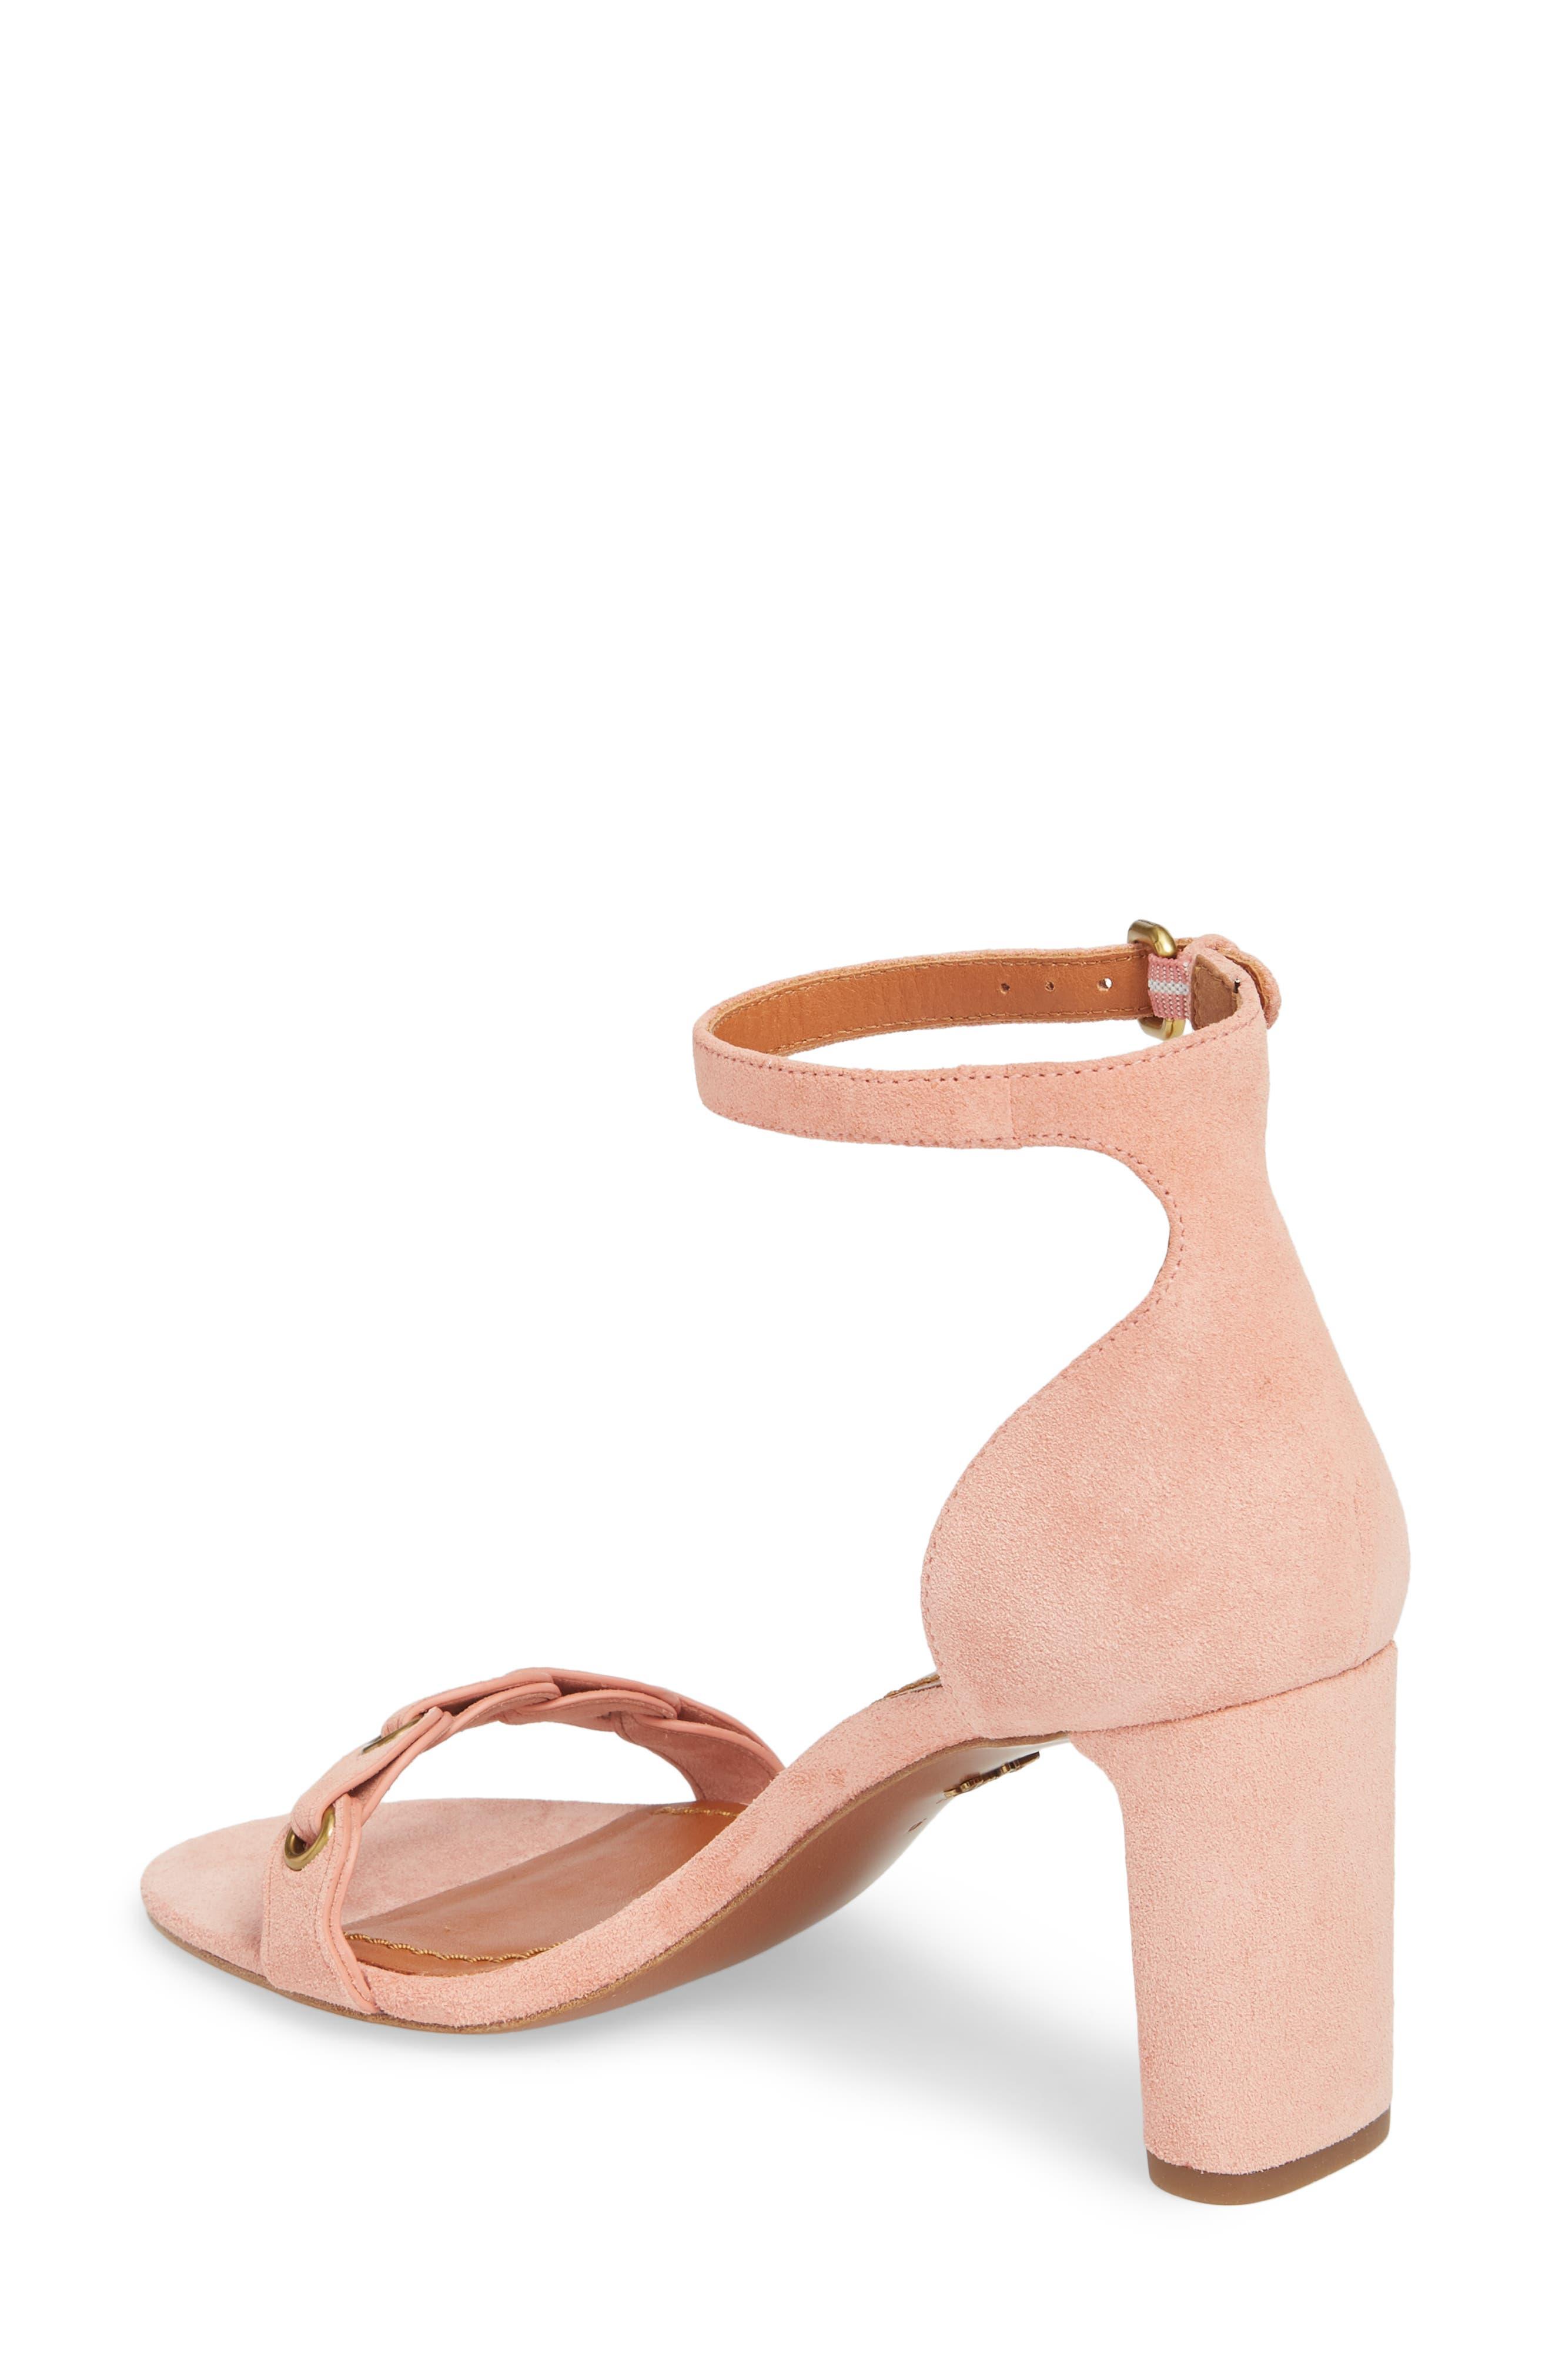 Link Strap Sandal,                             Alternate thumbnail 3, color,                             Peony Leather